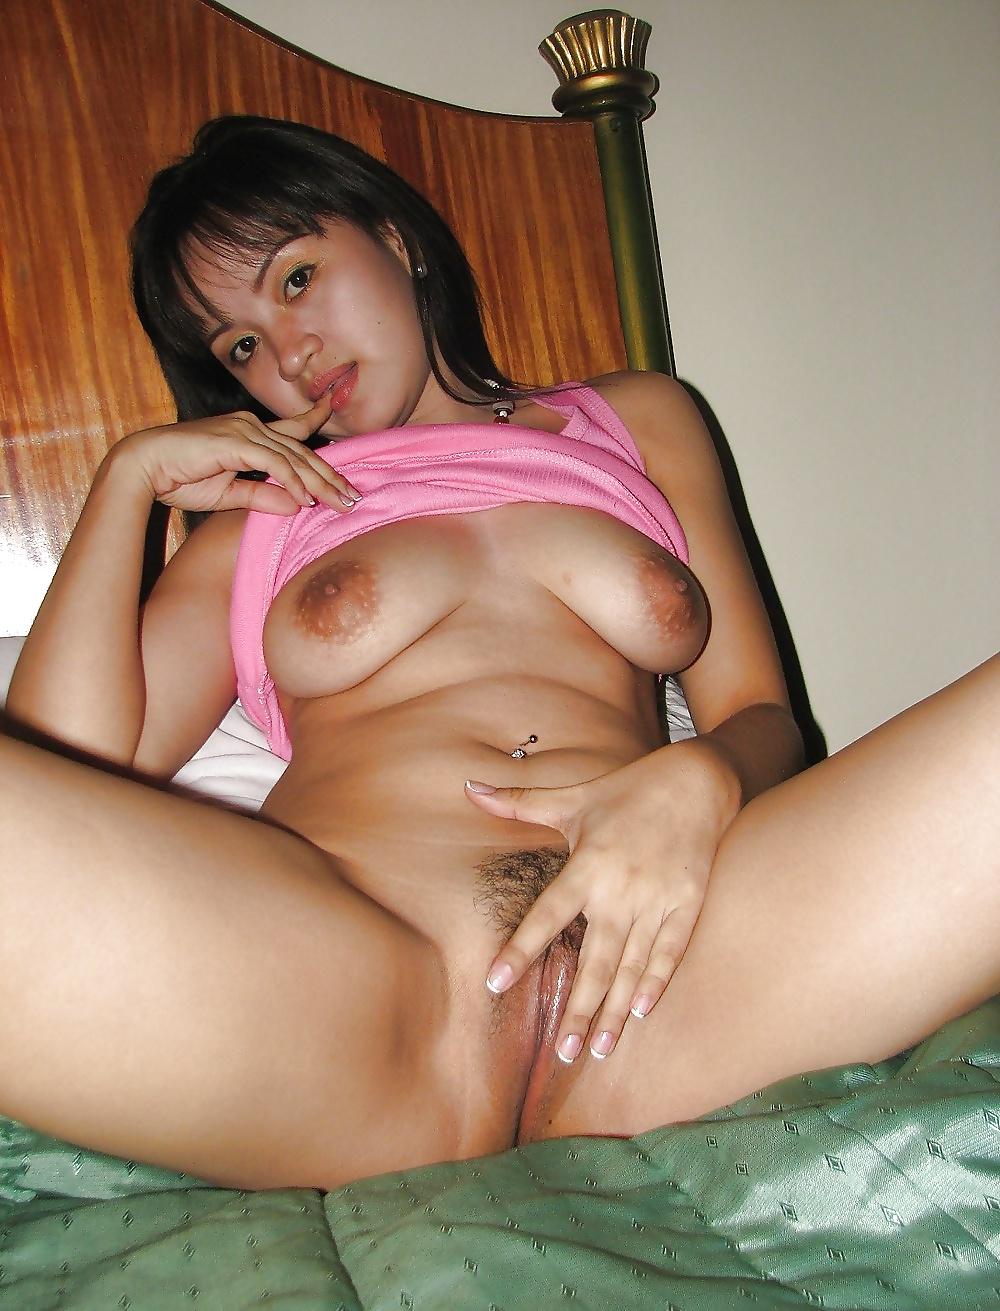 filipina-cuties-porn-flat-chested-mature-fuck-gif